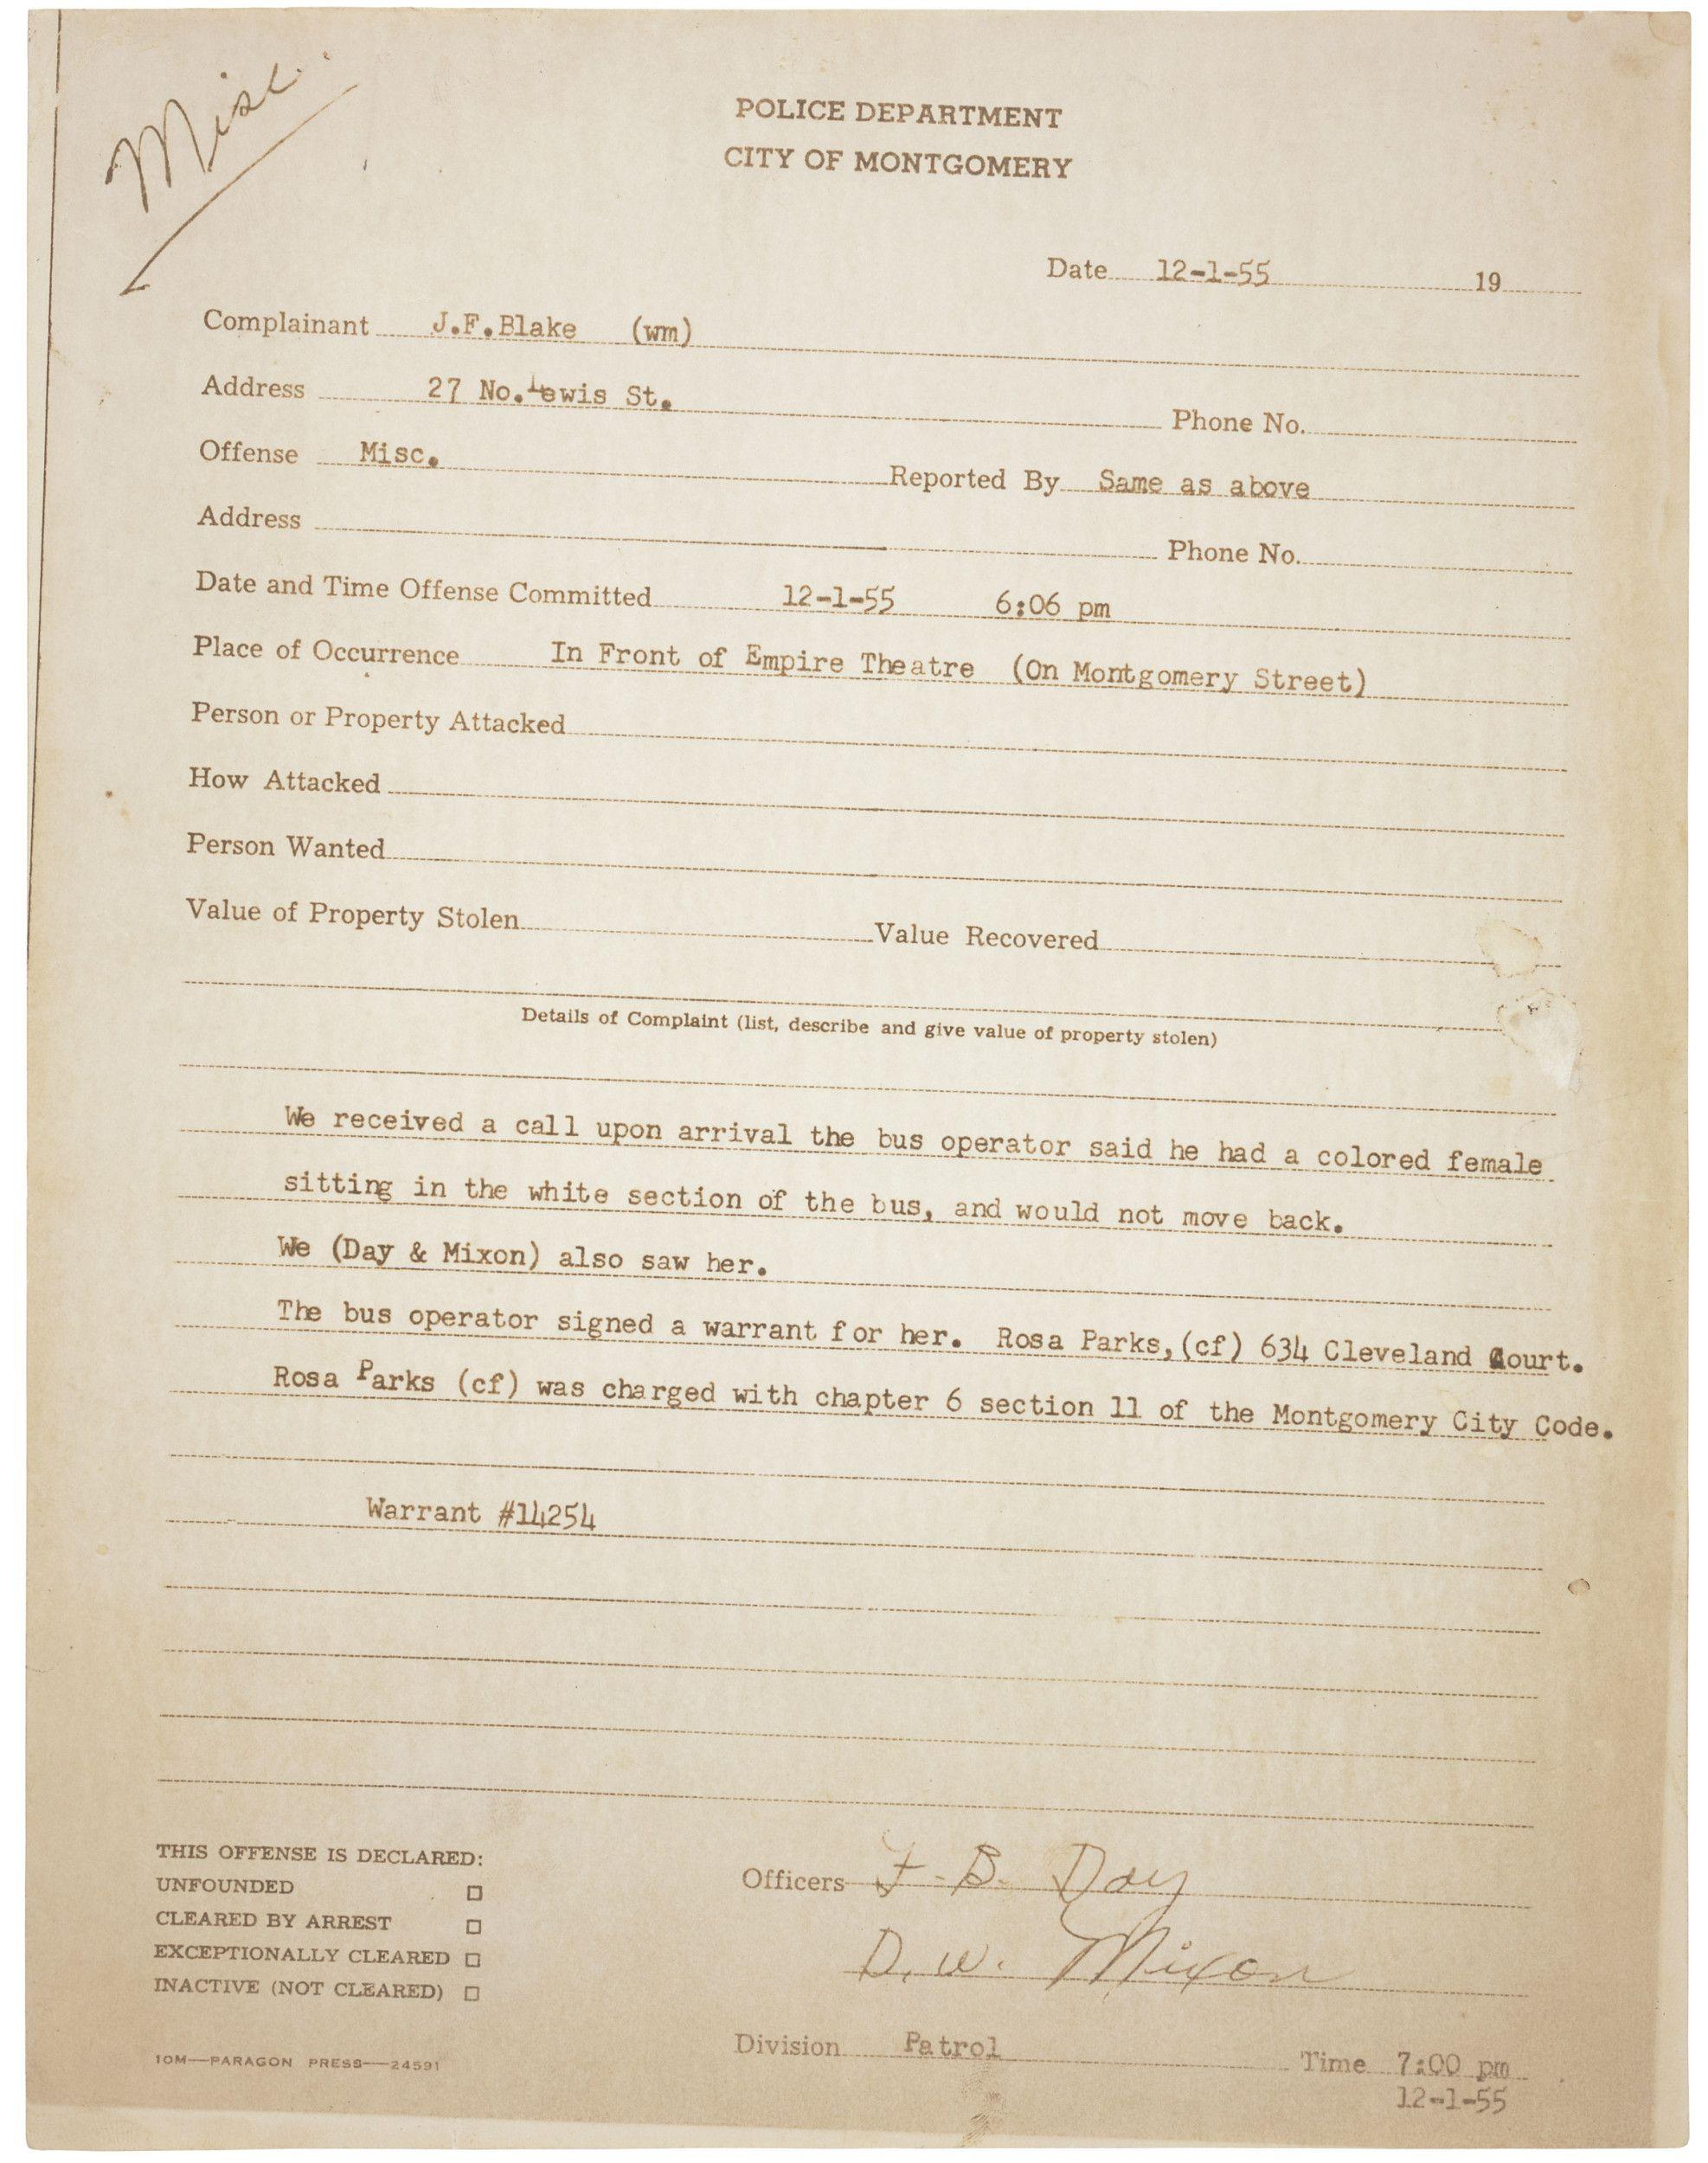 Police Report On Arrest Of Rosa Parks